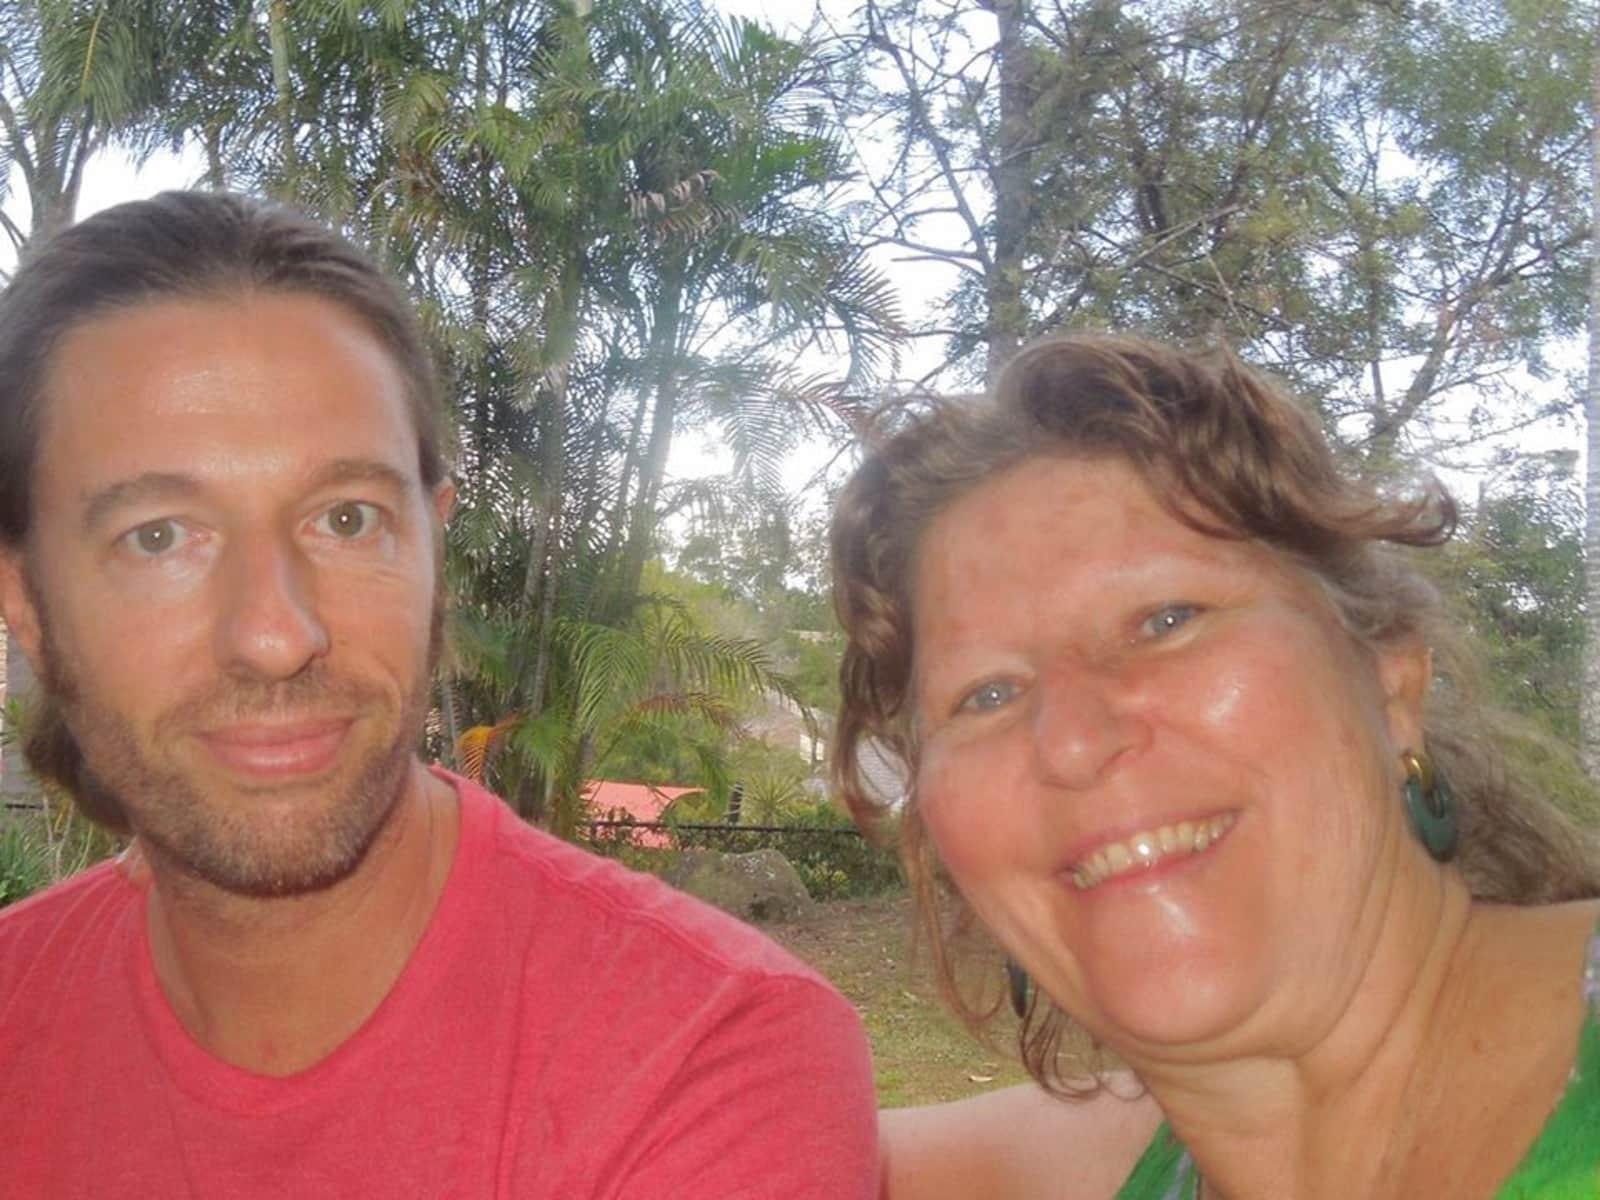 Kc & Brett from Gold Coast, Queensland, Australia